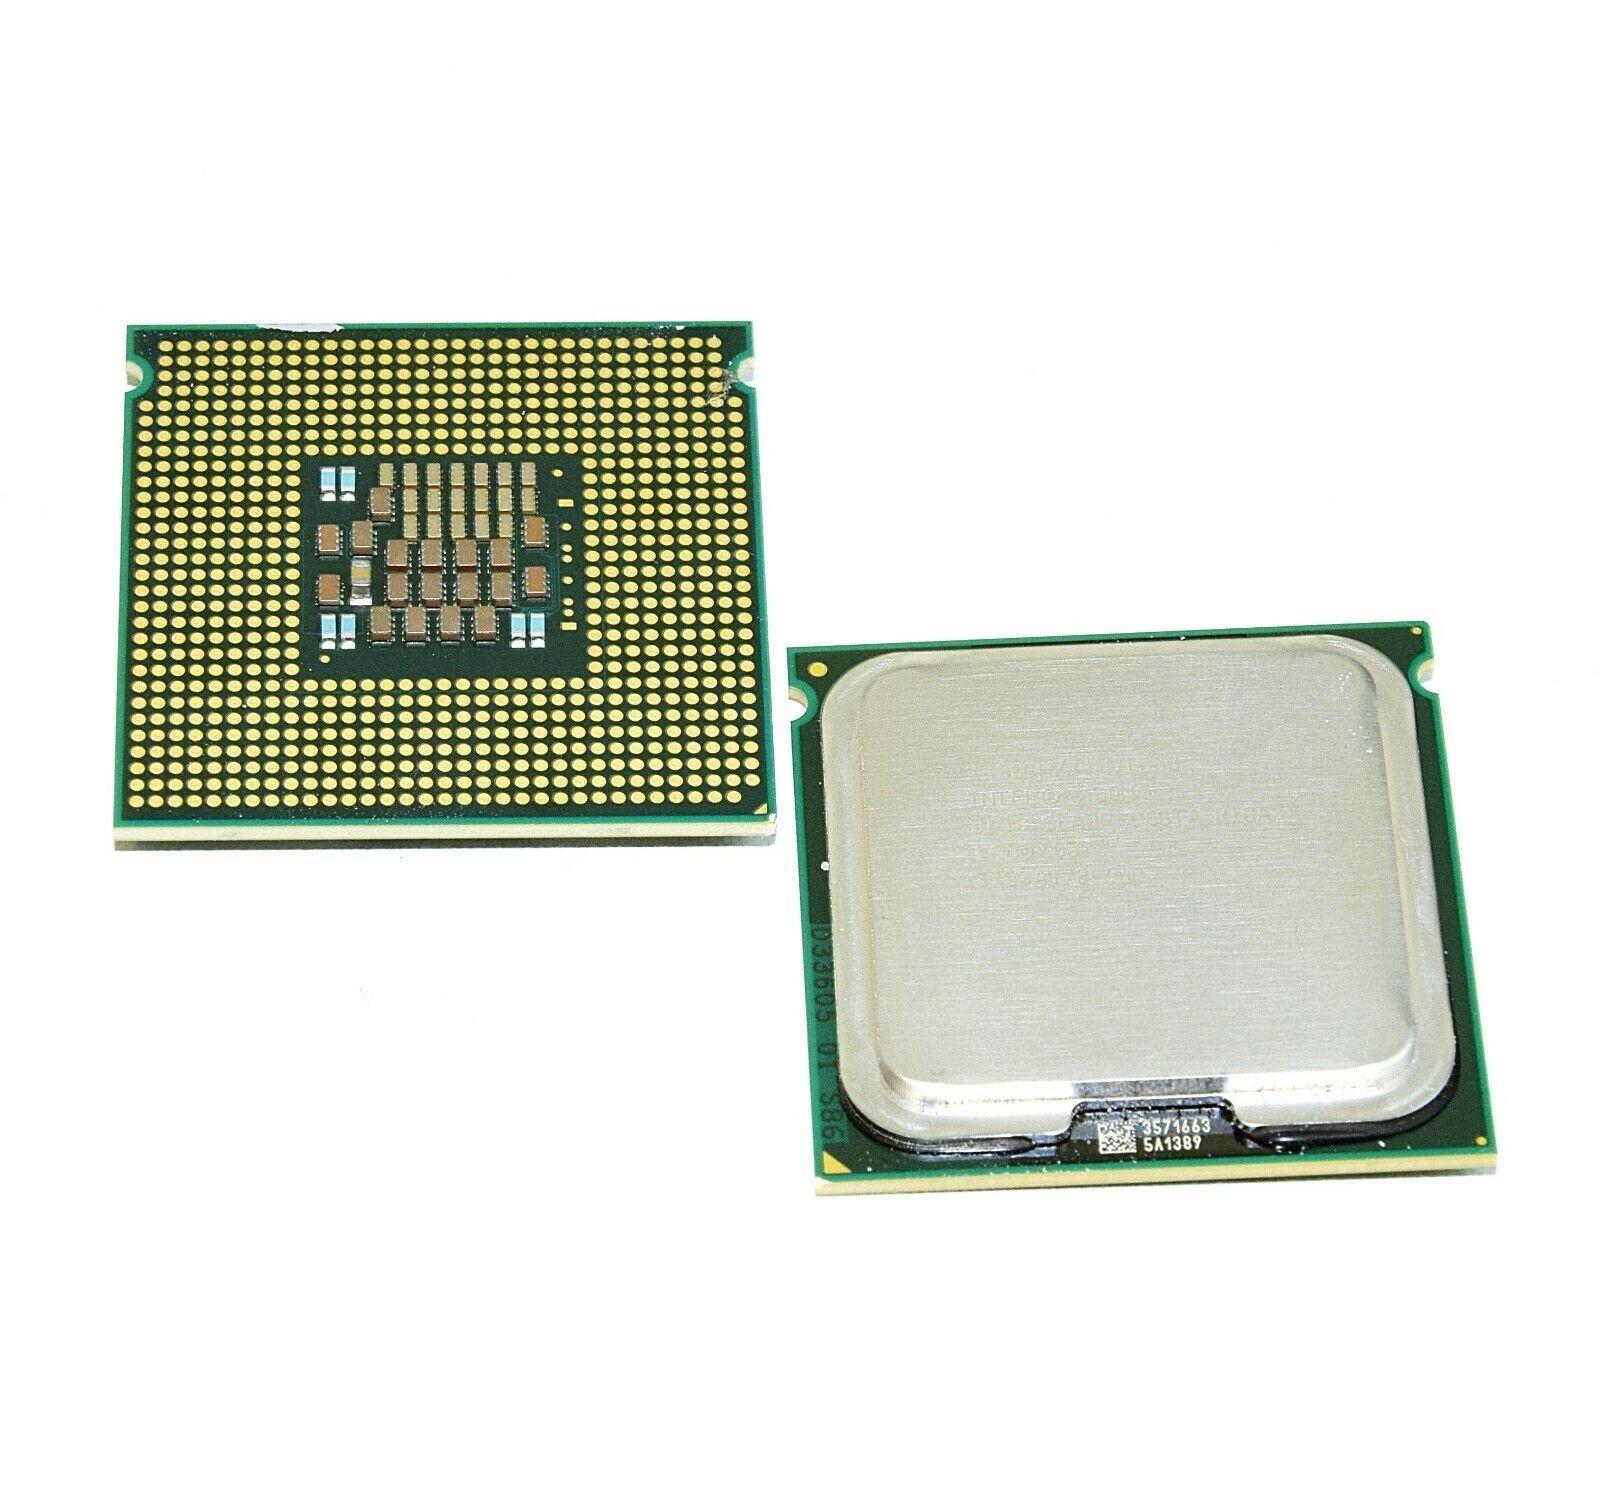 Intel Xeon 5130 Dual Core 2GHz / 4MB / 1333MHz FSB SLABP Processor